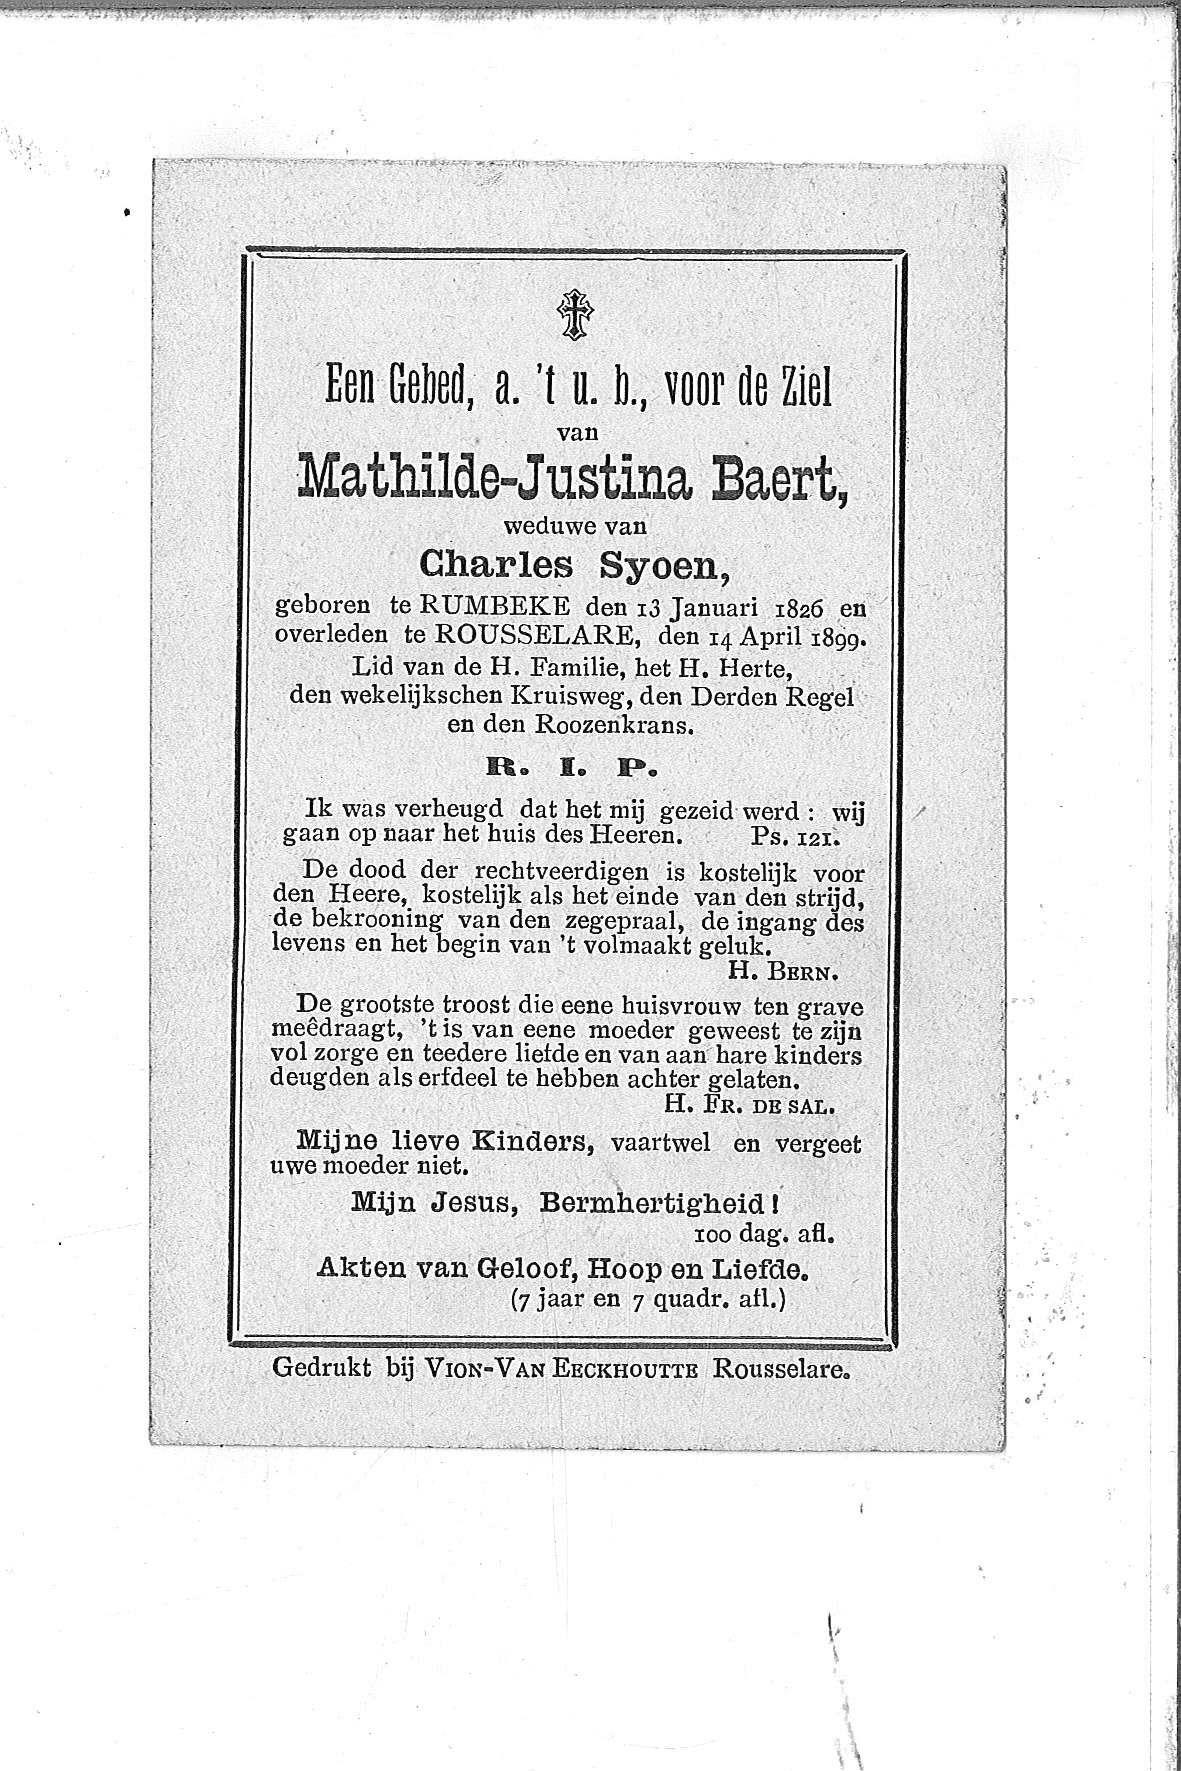 Mathilde-Justina(1899)20140701121722_00040.jpg